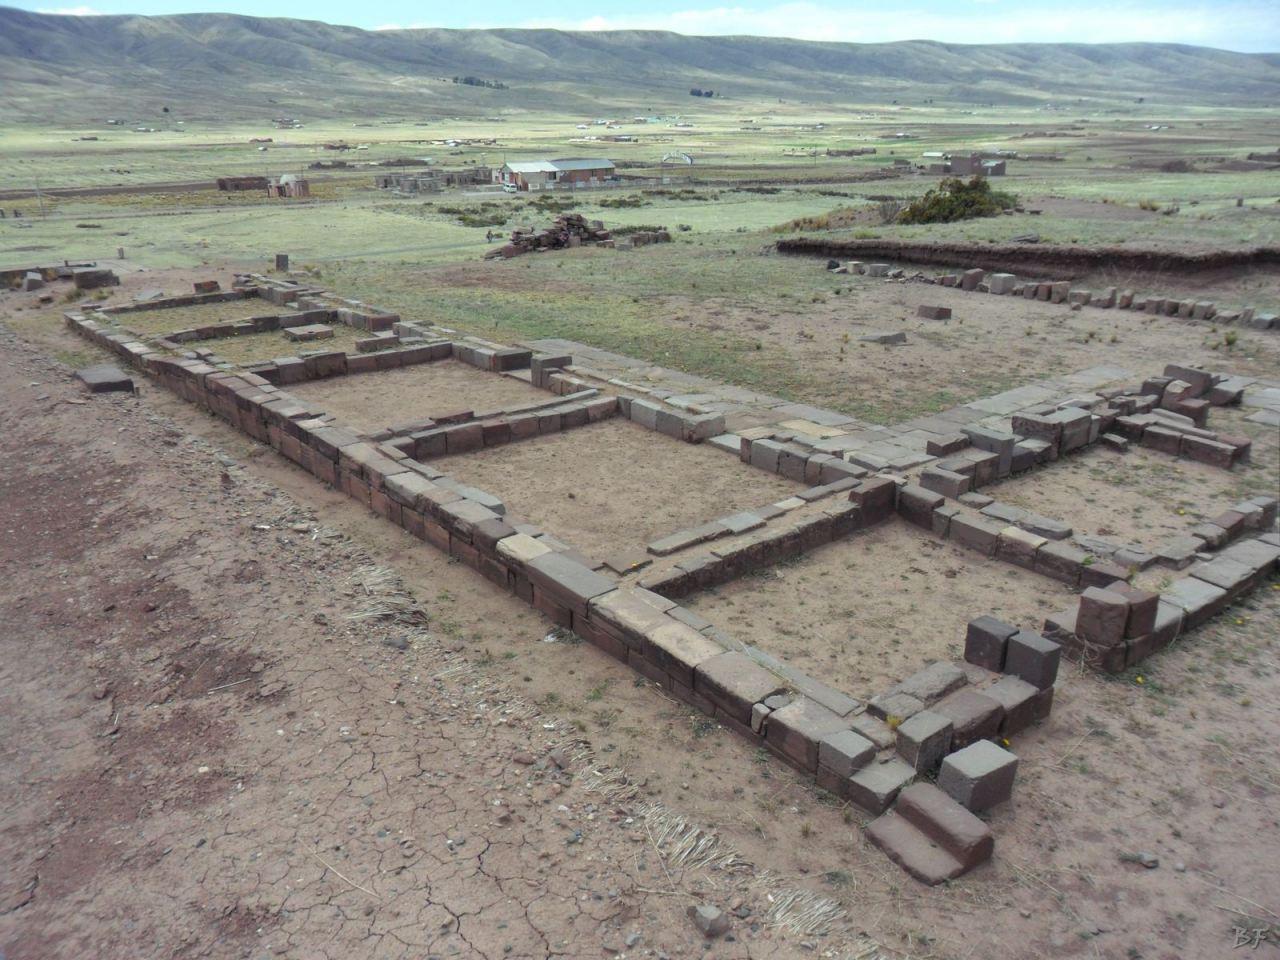 Sito-Megalitico-Piramide-Akapana-Kalasasaya-Menhir-Tiahuanaco-Bolivia-119